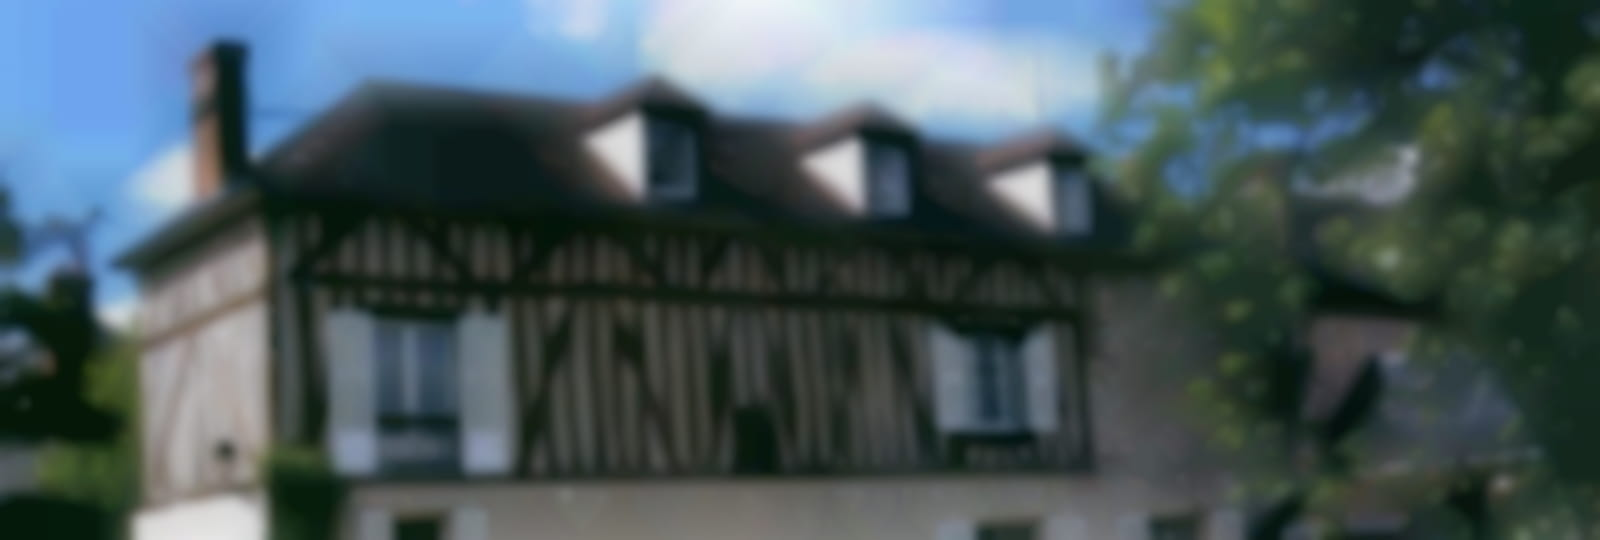 Maison Mathieu